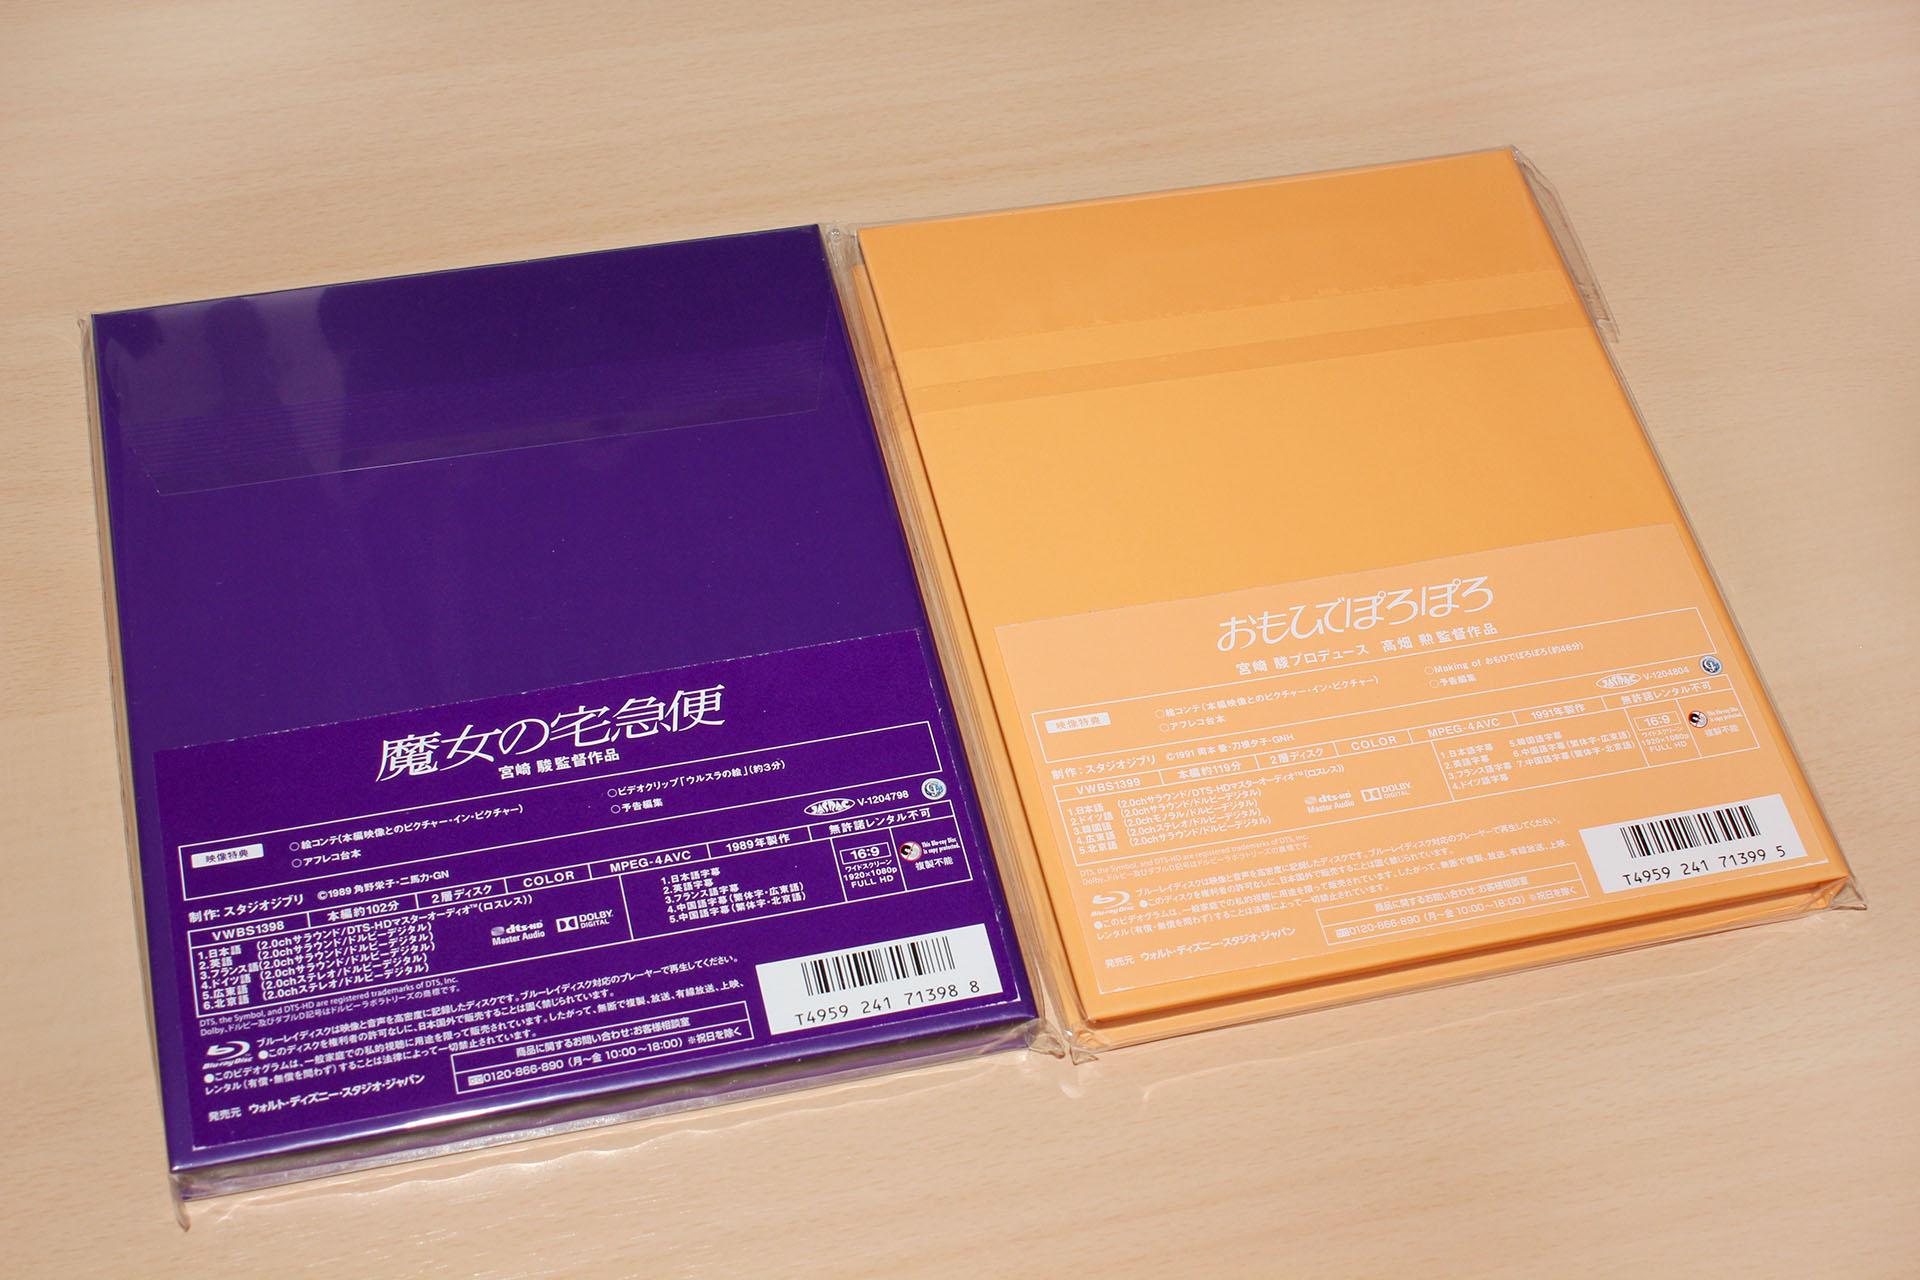 2012-12-09-KIKI_ONLY_YESTERDAY-BD-2.JPG